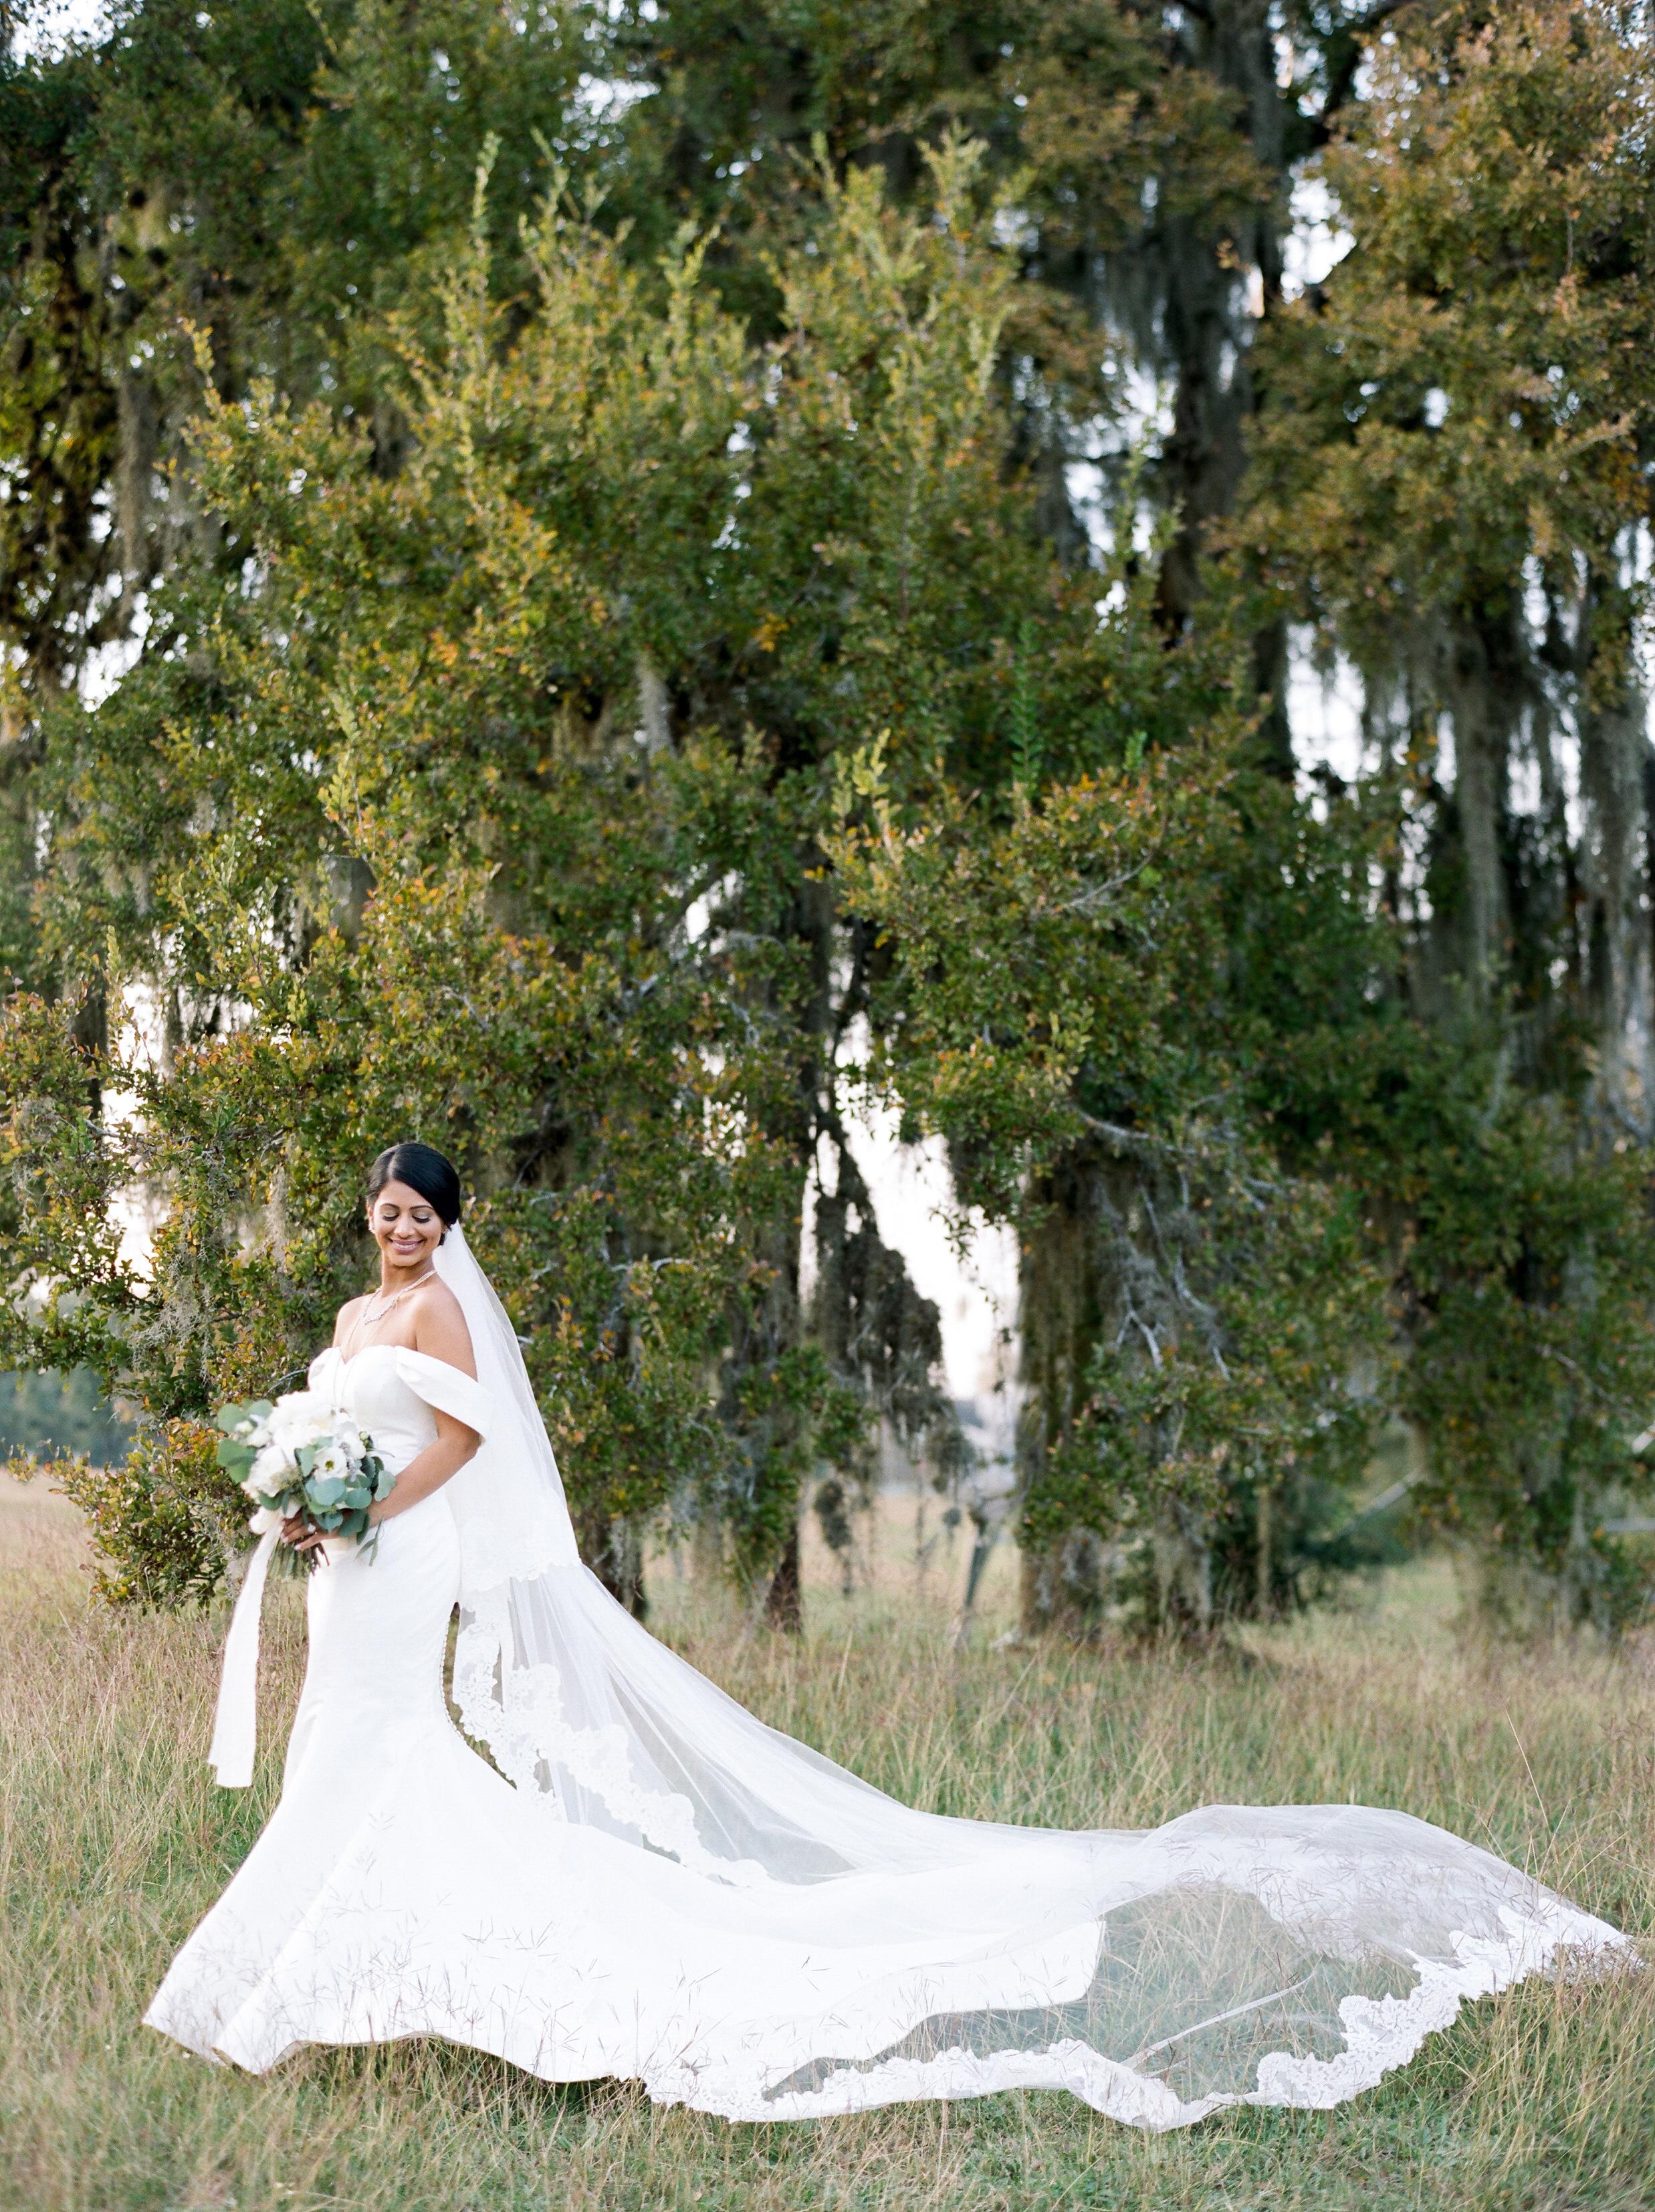 Fine-Art-Film-Houston-Wedding-Photographer-Best-Top-Luxury-Texas-Austin-Dallas-Destination-Dana-Fernandez-Photography-The-Bell-Tower-on-34th-Indian-21.jpg